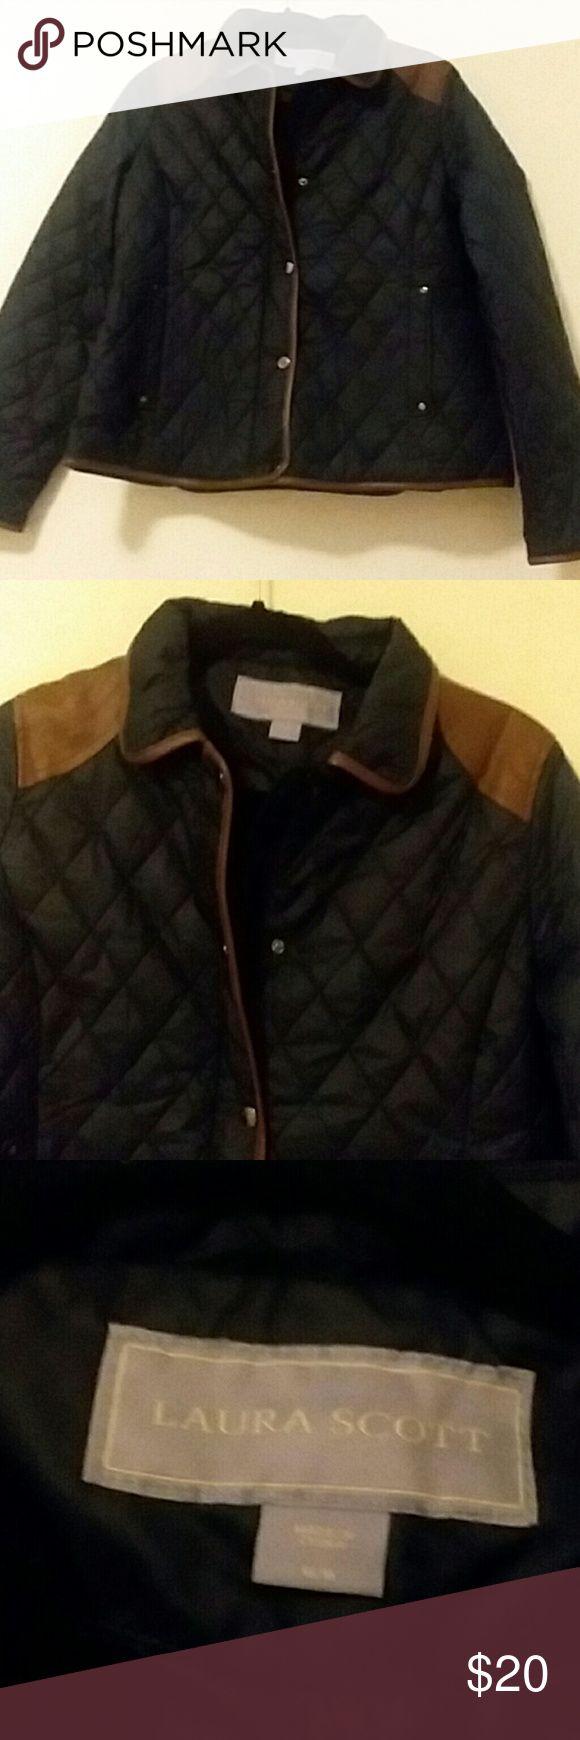 🌒 NWT Laura Scott navy blue jacket coat - size m NWT Laura Scott Jackets & Coats